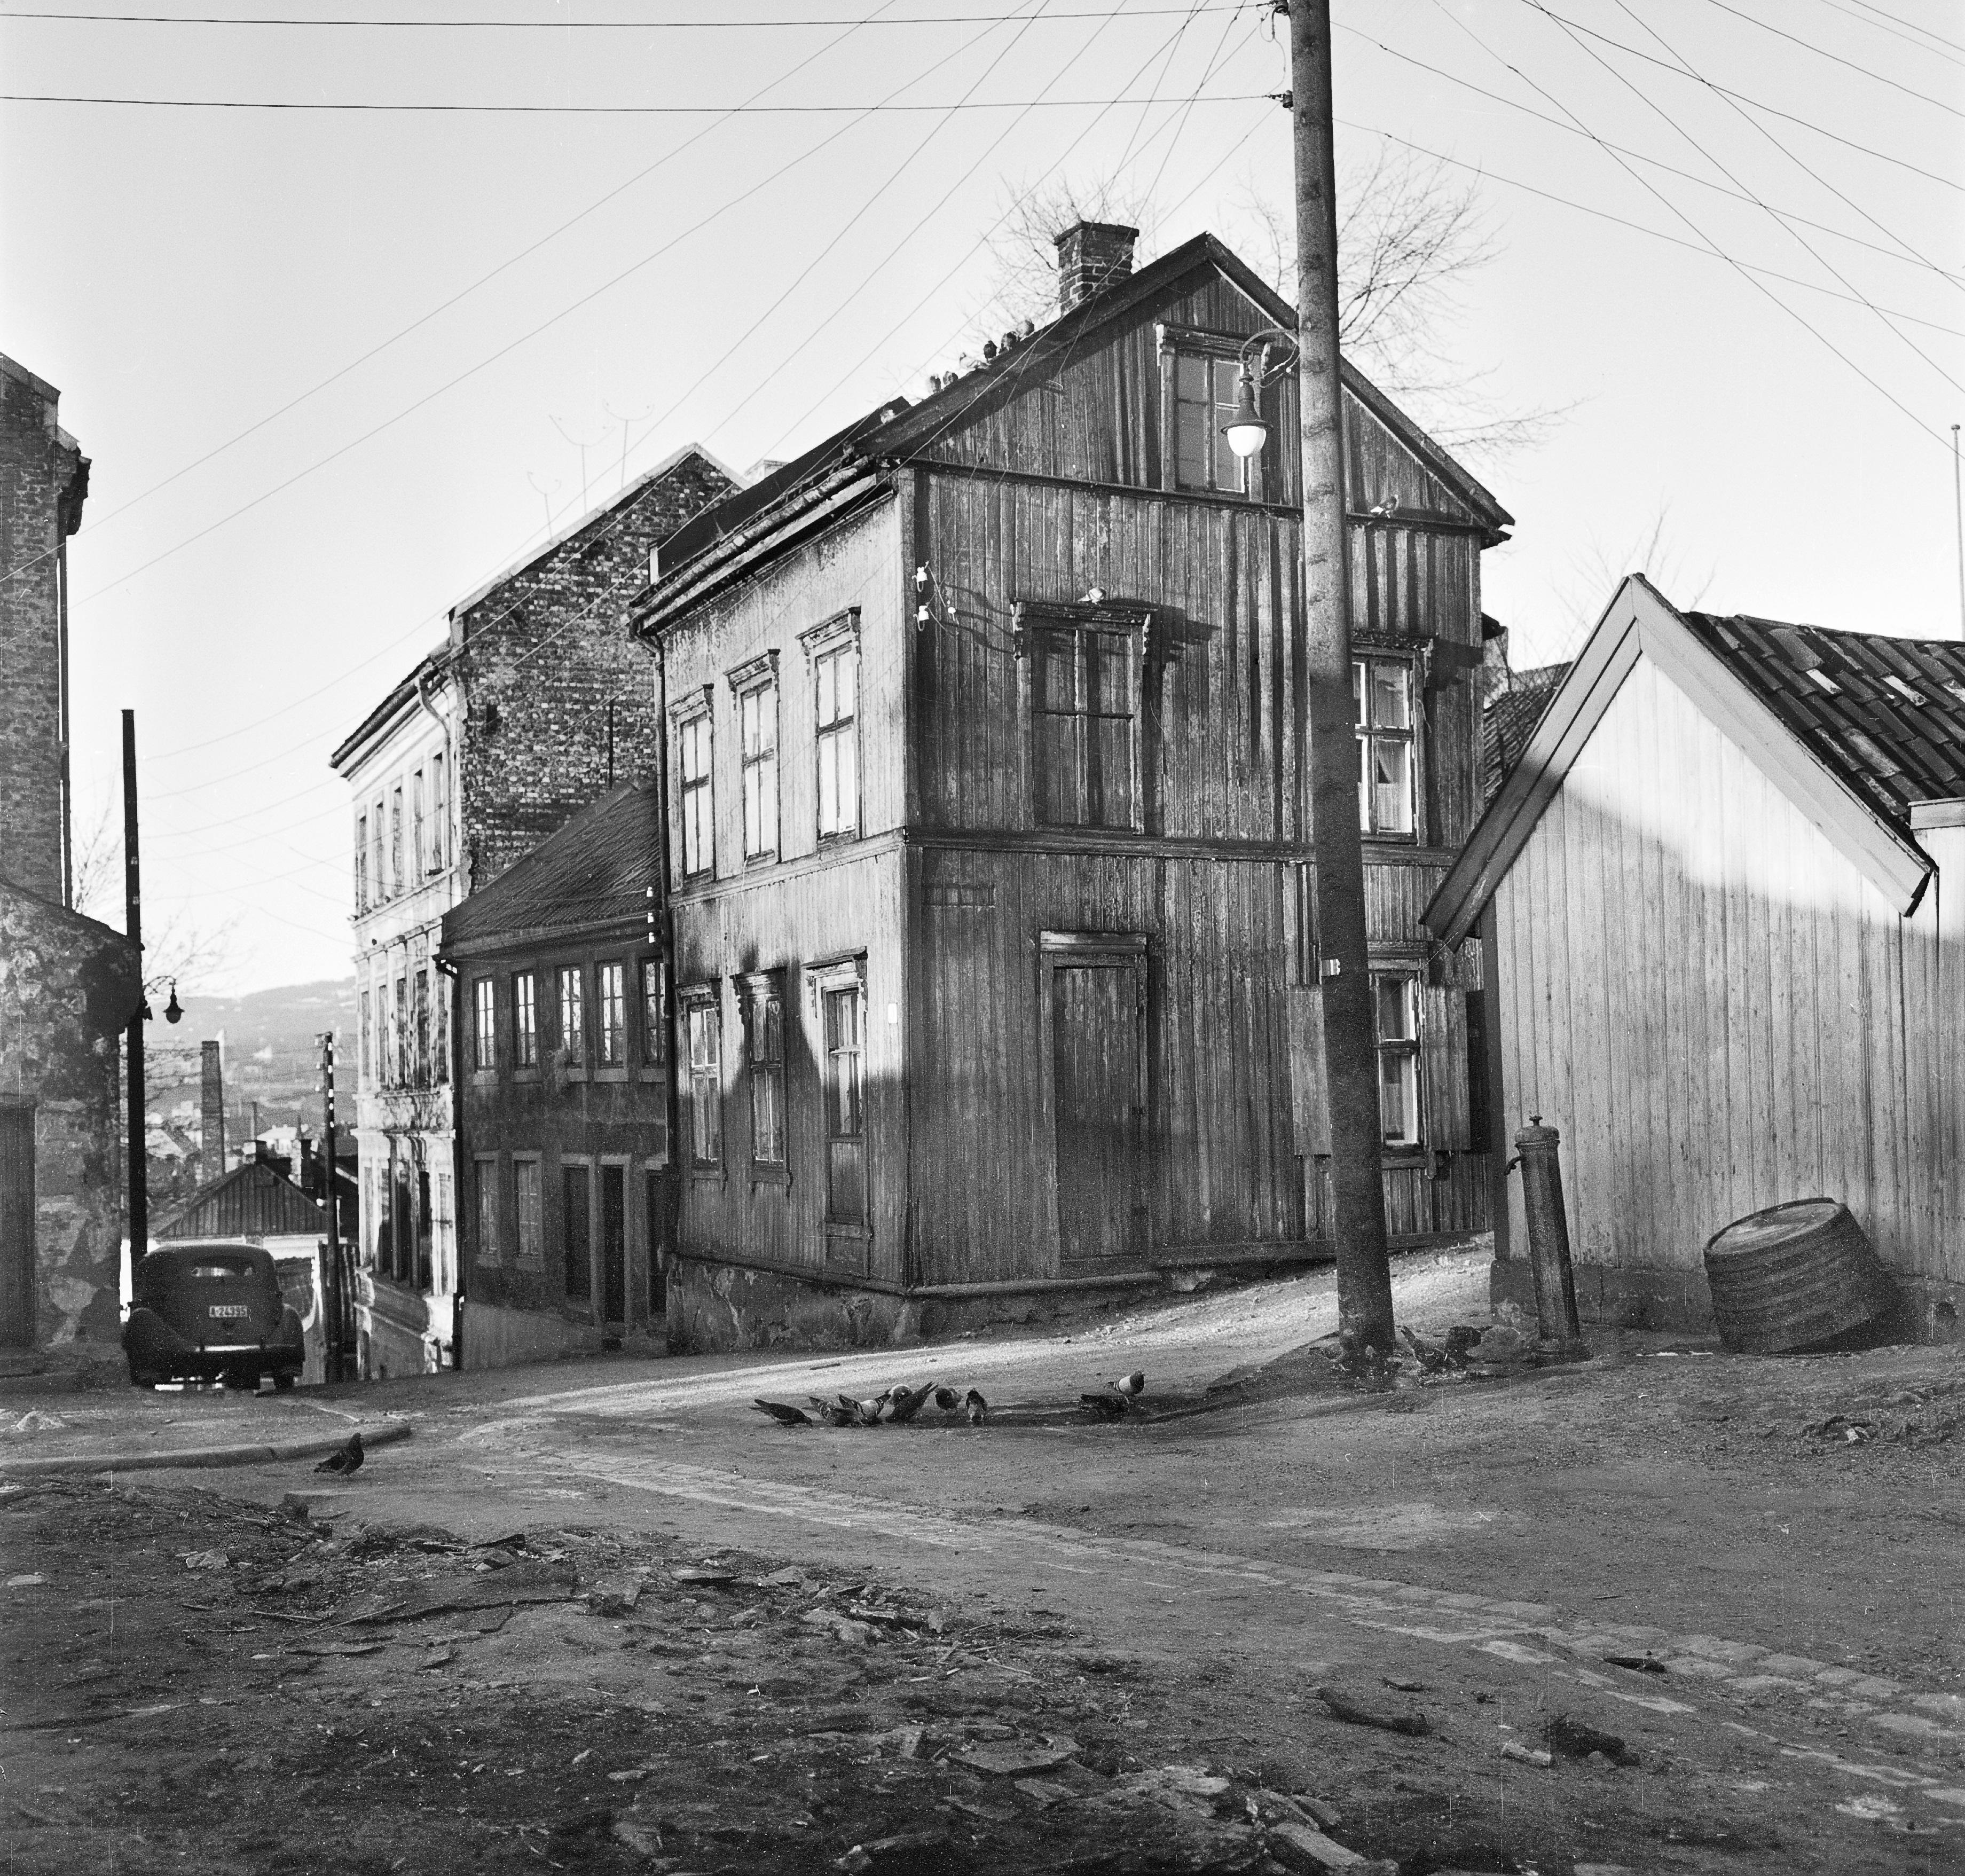 Trehusbebyggelse med vannpost på Enerhaugen, krysset Langleiken og Johannesgata i 1959. Foto: Peter Anker, Oslo Museum OB.A1088.